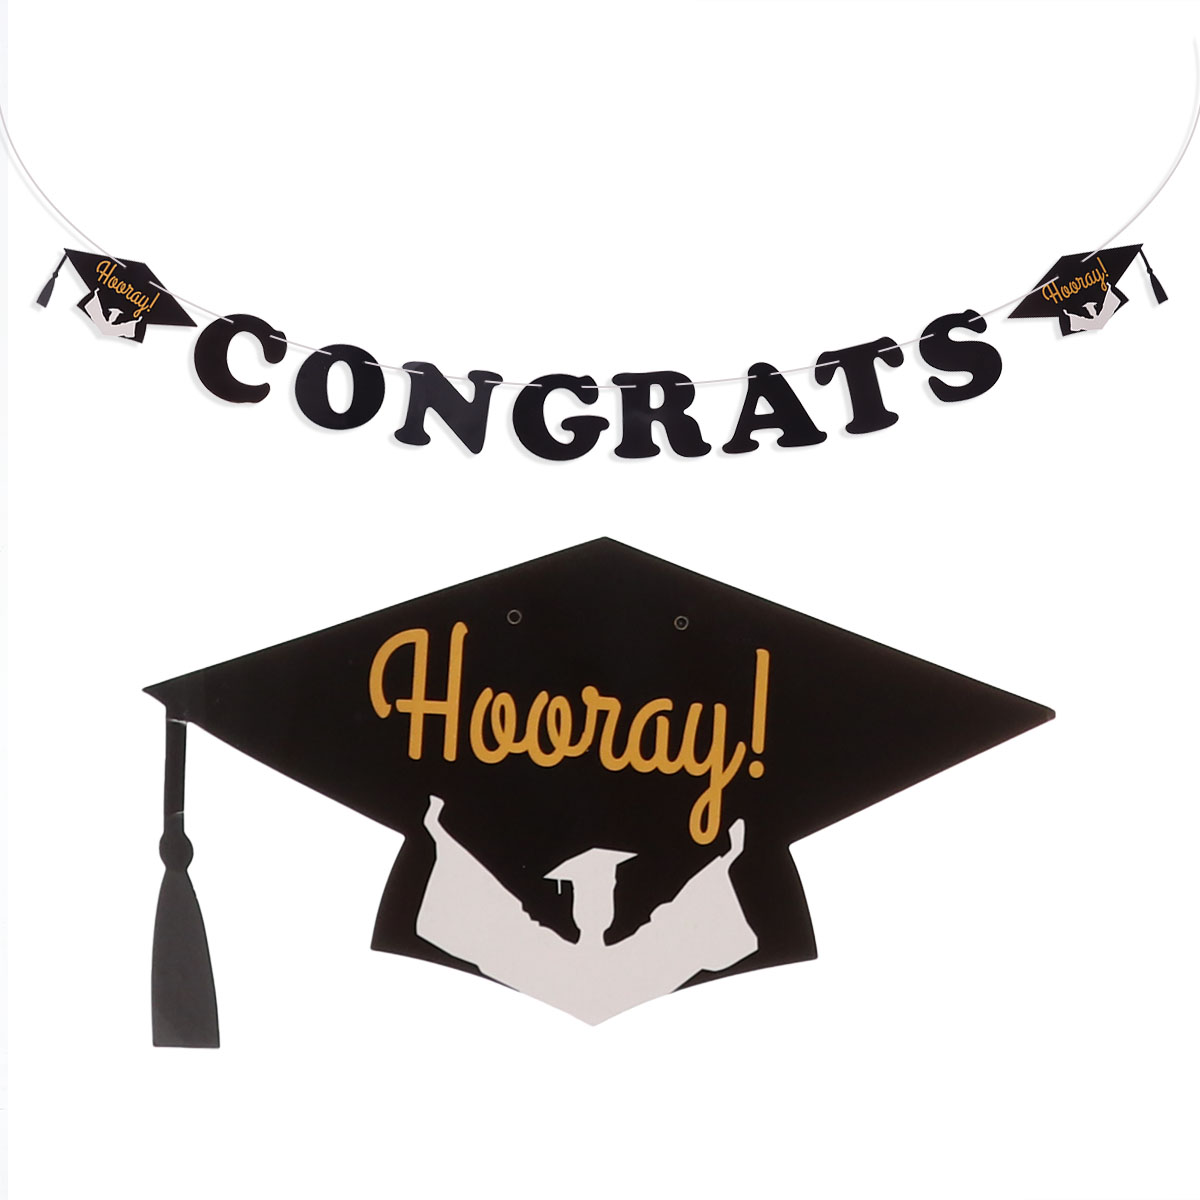 2020 New Graduation Party Banner Congrats Printing Hanging Banner For Graduate Student 2020 Graduation Party Decorations